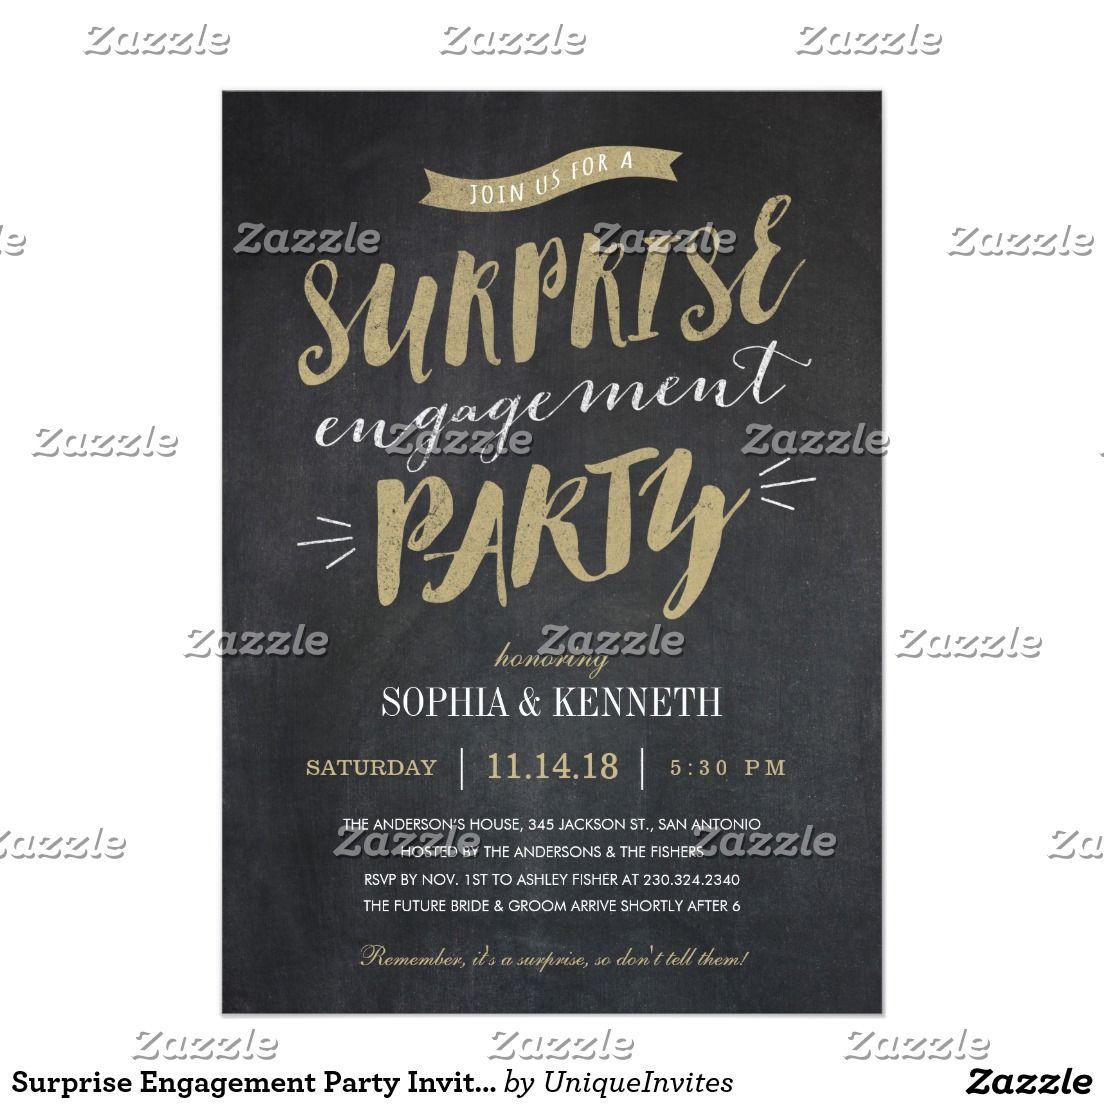 Surprise Engagement Party Invitations - Chalkboard | Engagement ...